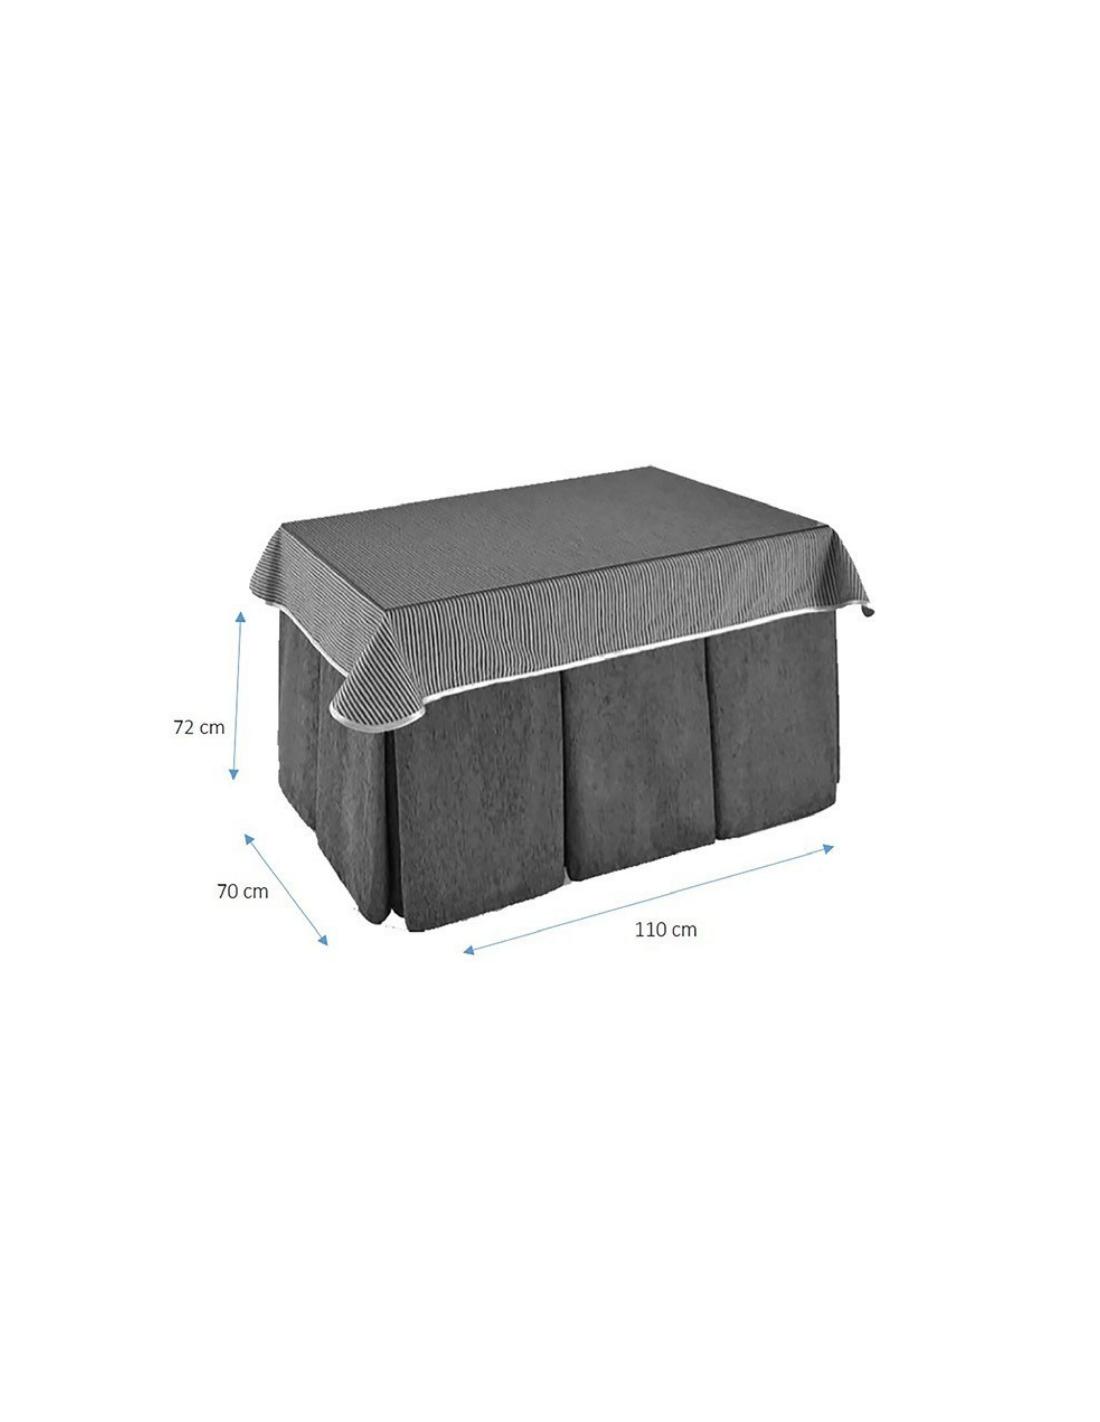 Mesa de comedor con cuatro patas rectangulares